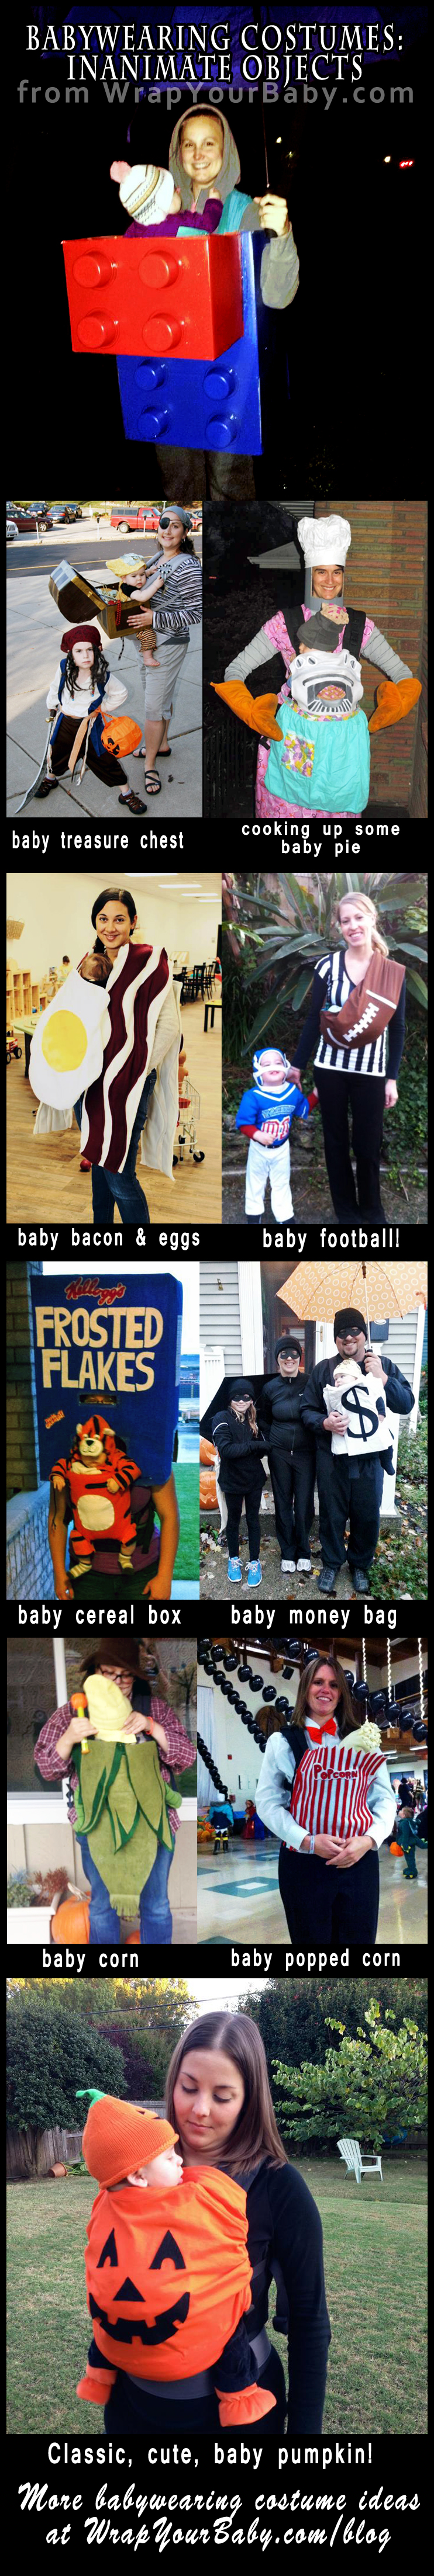 inanimate object babywearing costumes